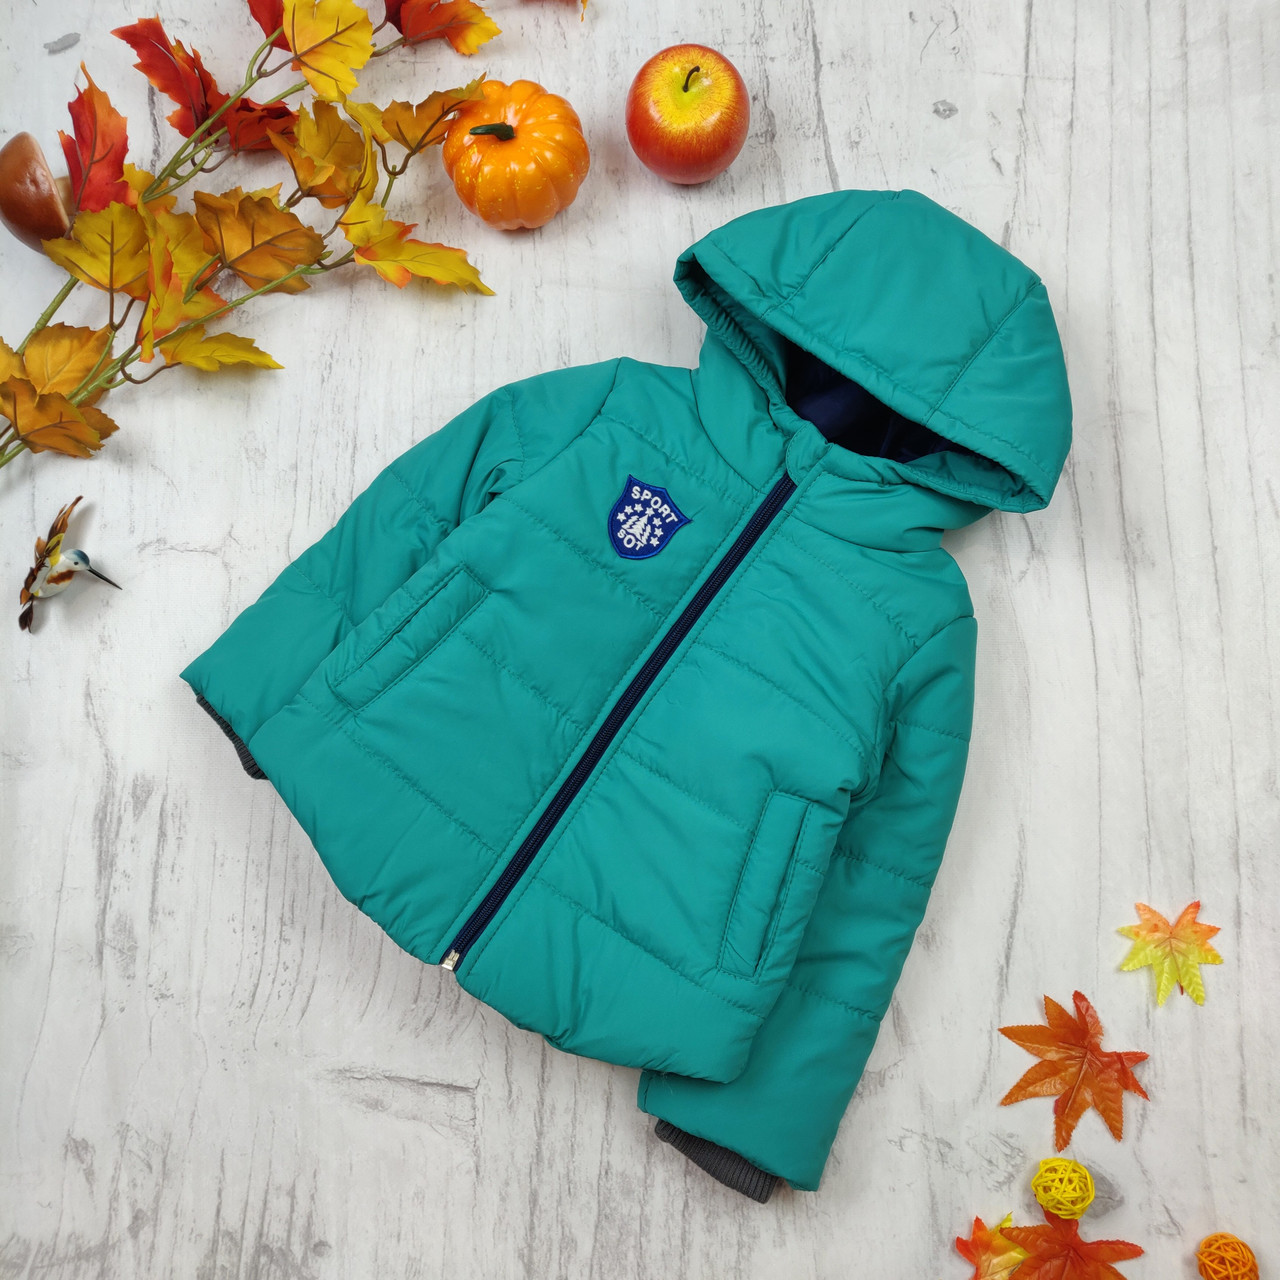 Детские куртки на мальчика демисезон на синтепоне 86